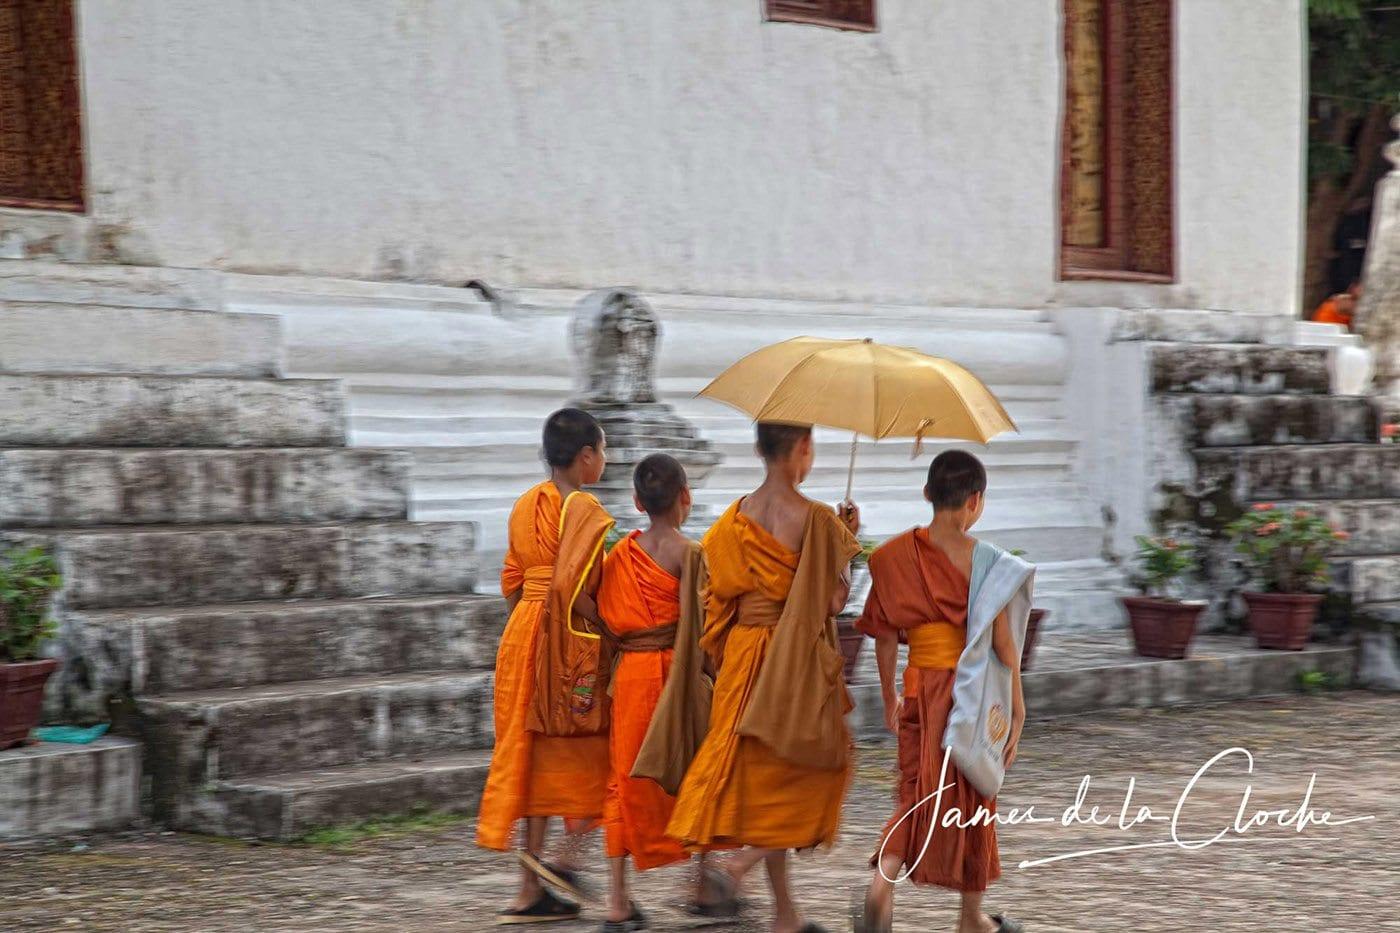 Young Monks Luang Prabang